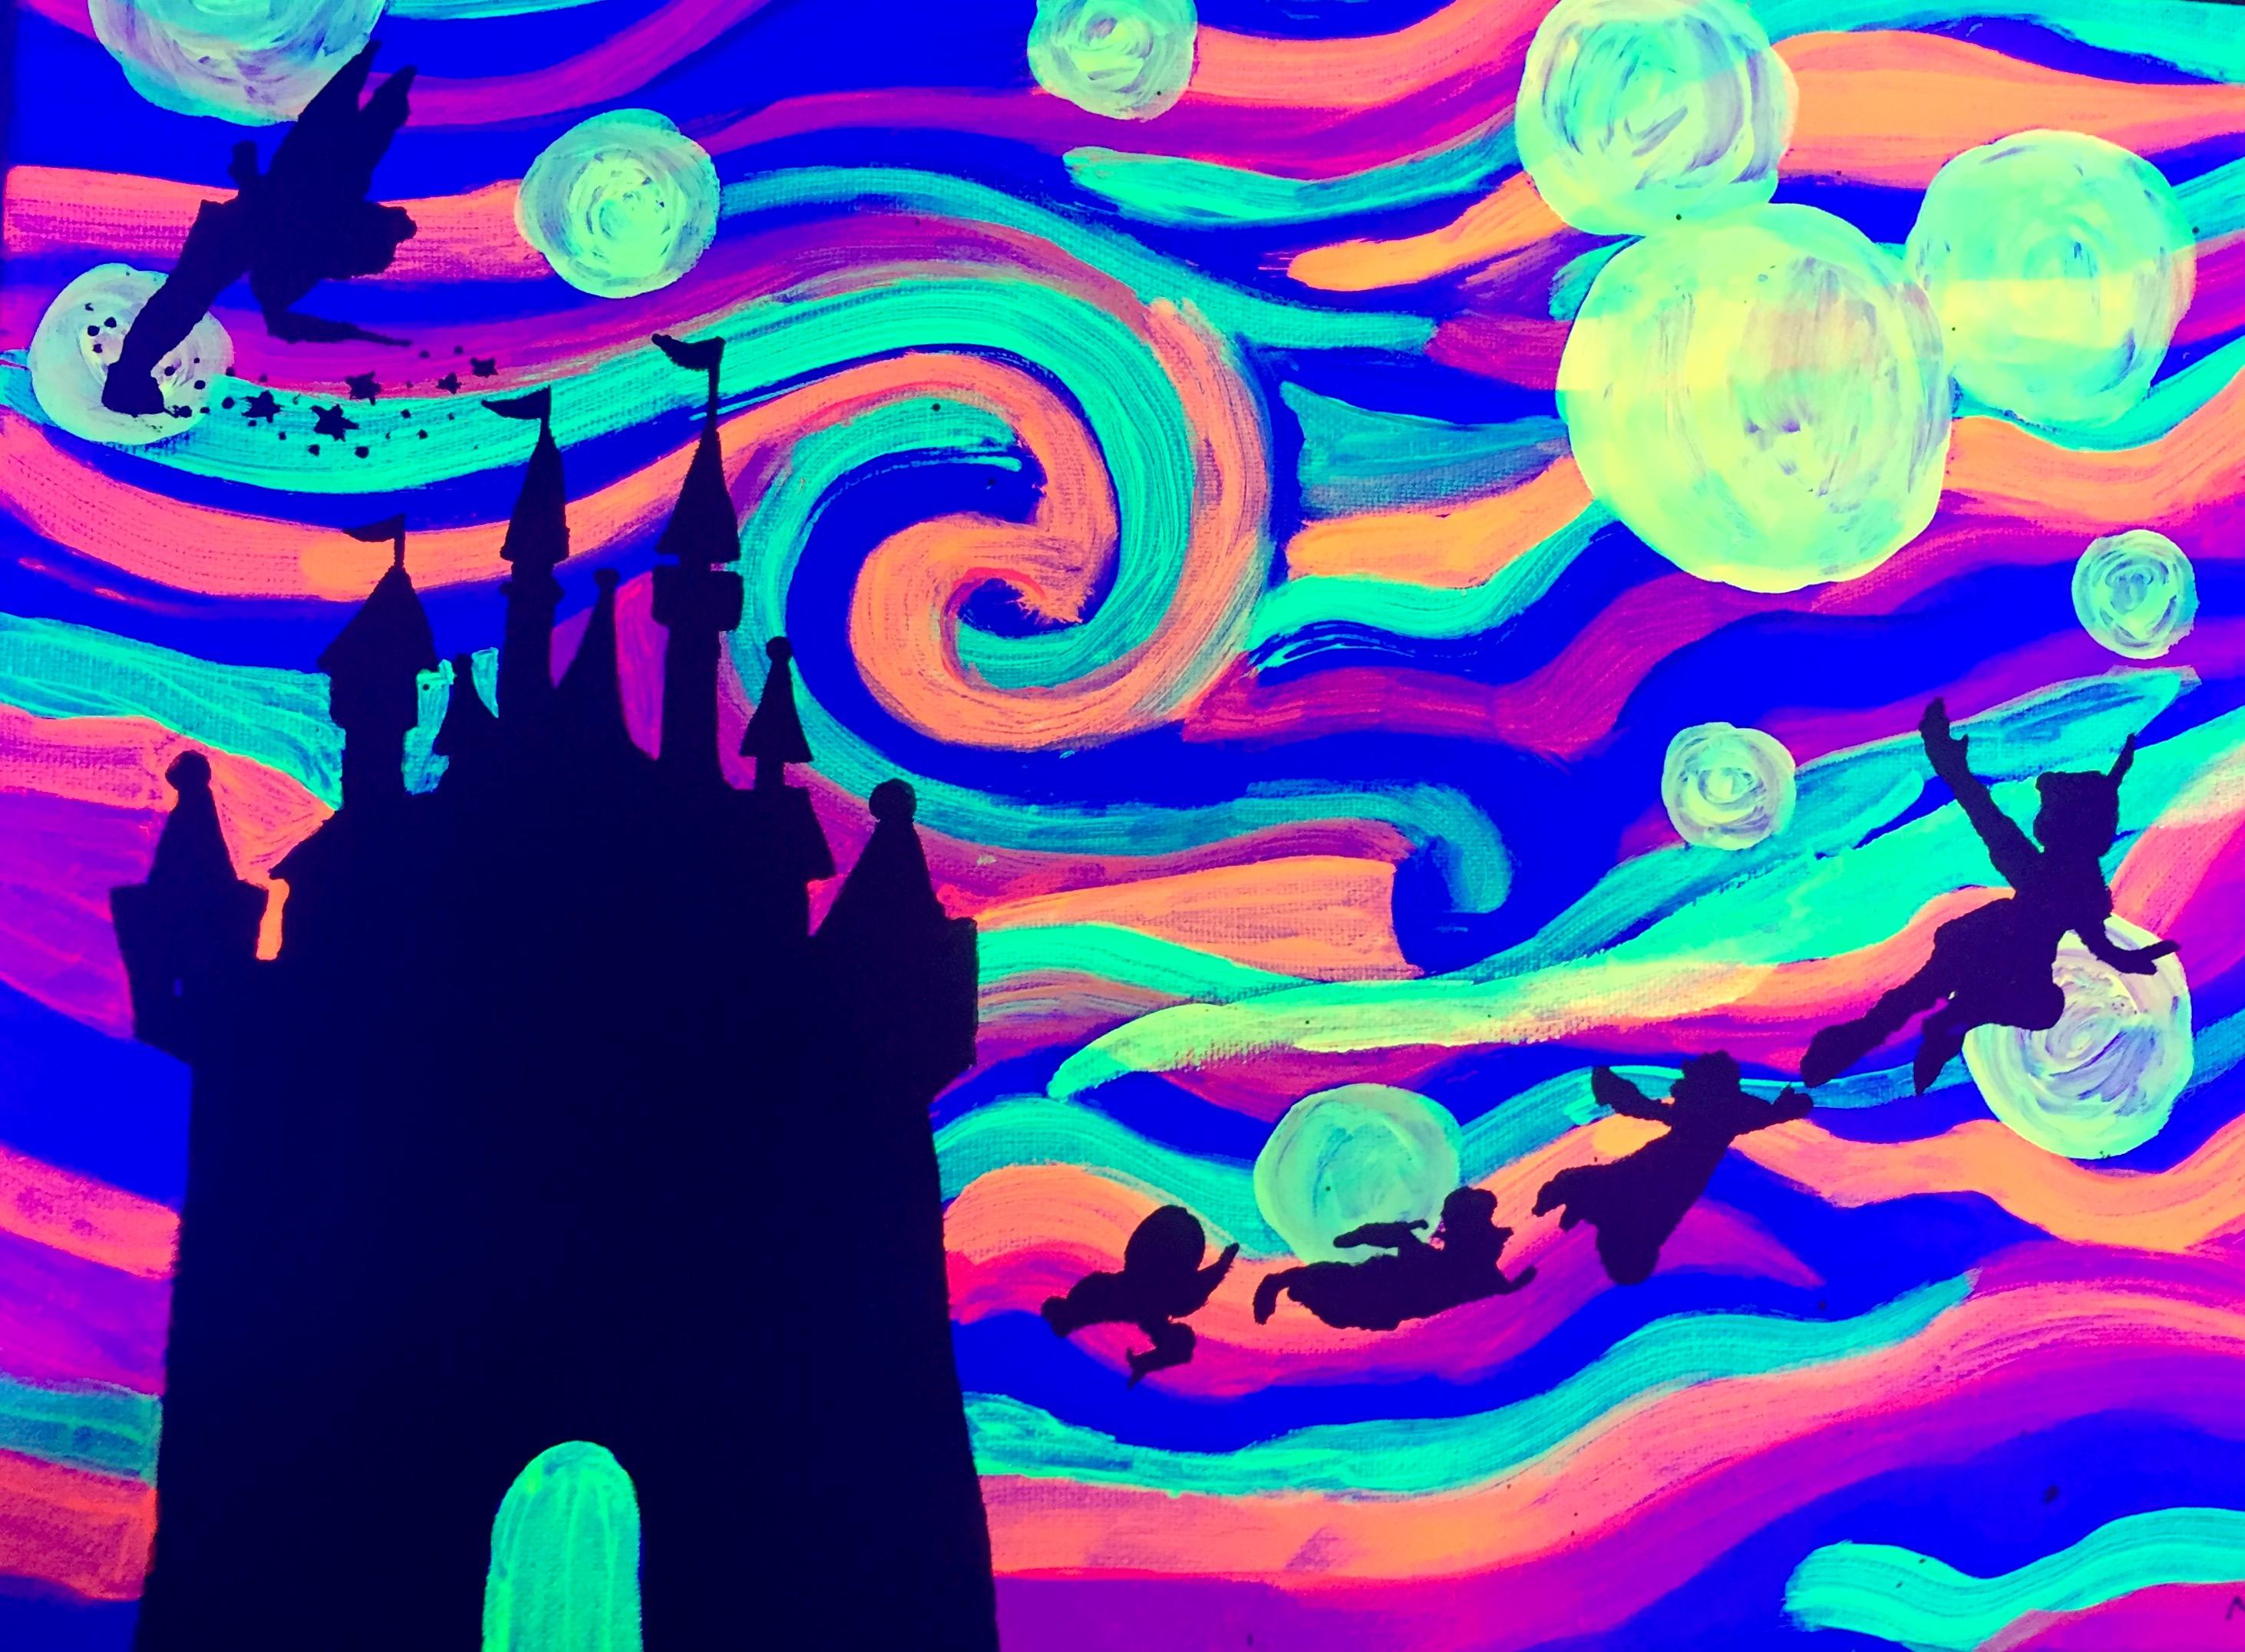 Glow Disney!